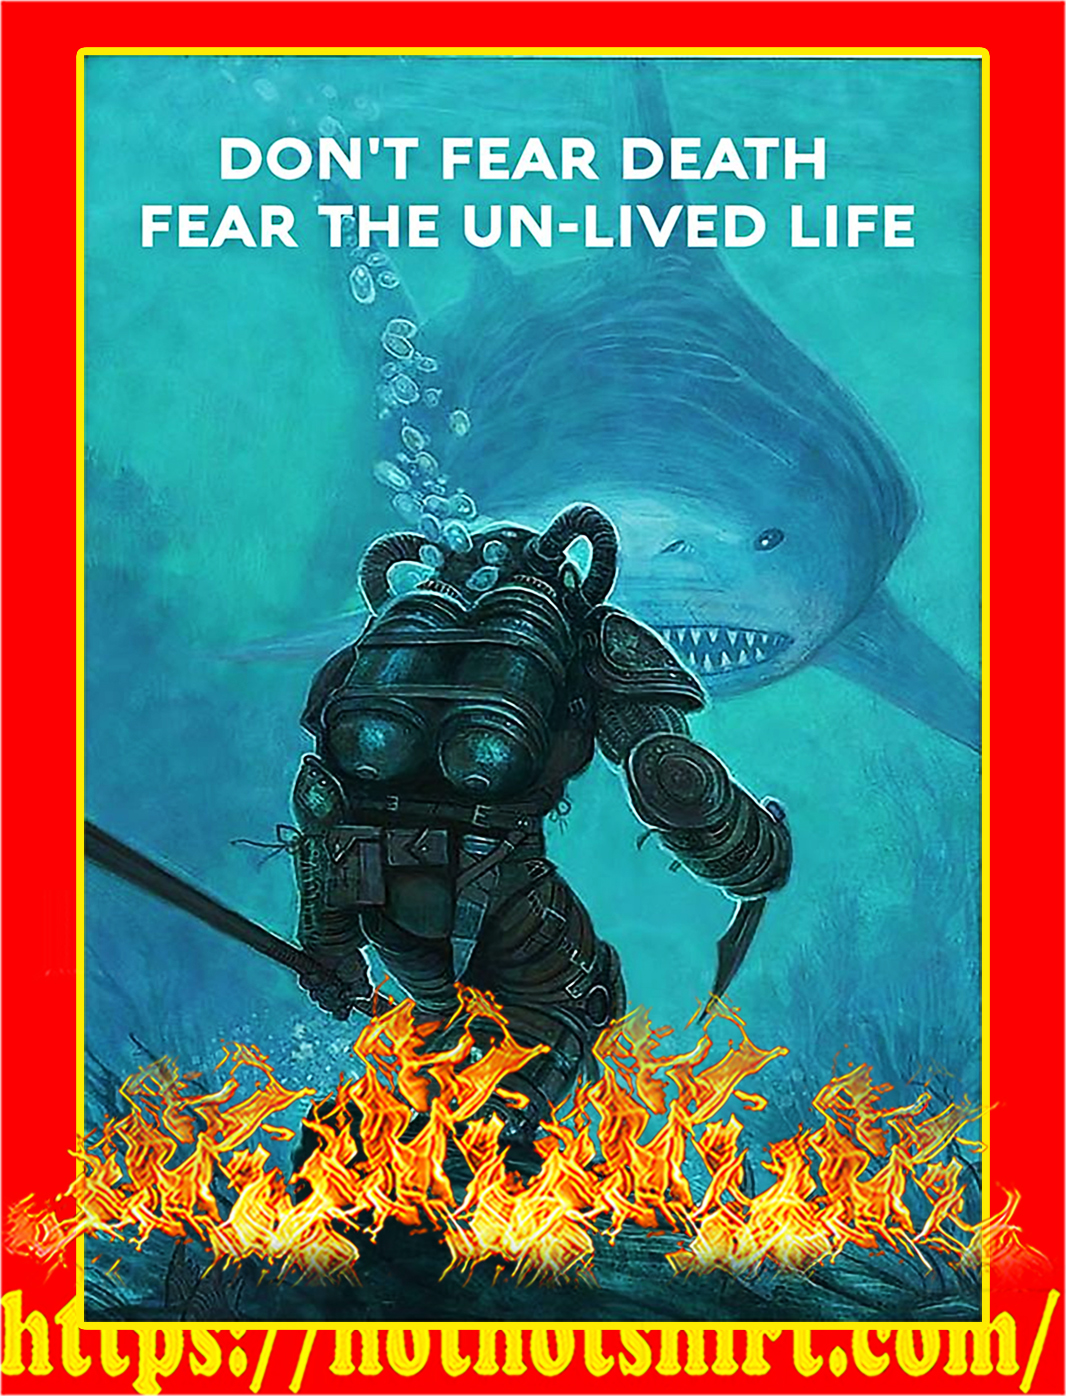 Scuba Don't fear death fear the un-lived life poster - A2